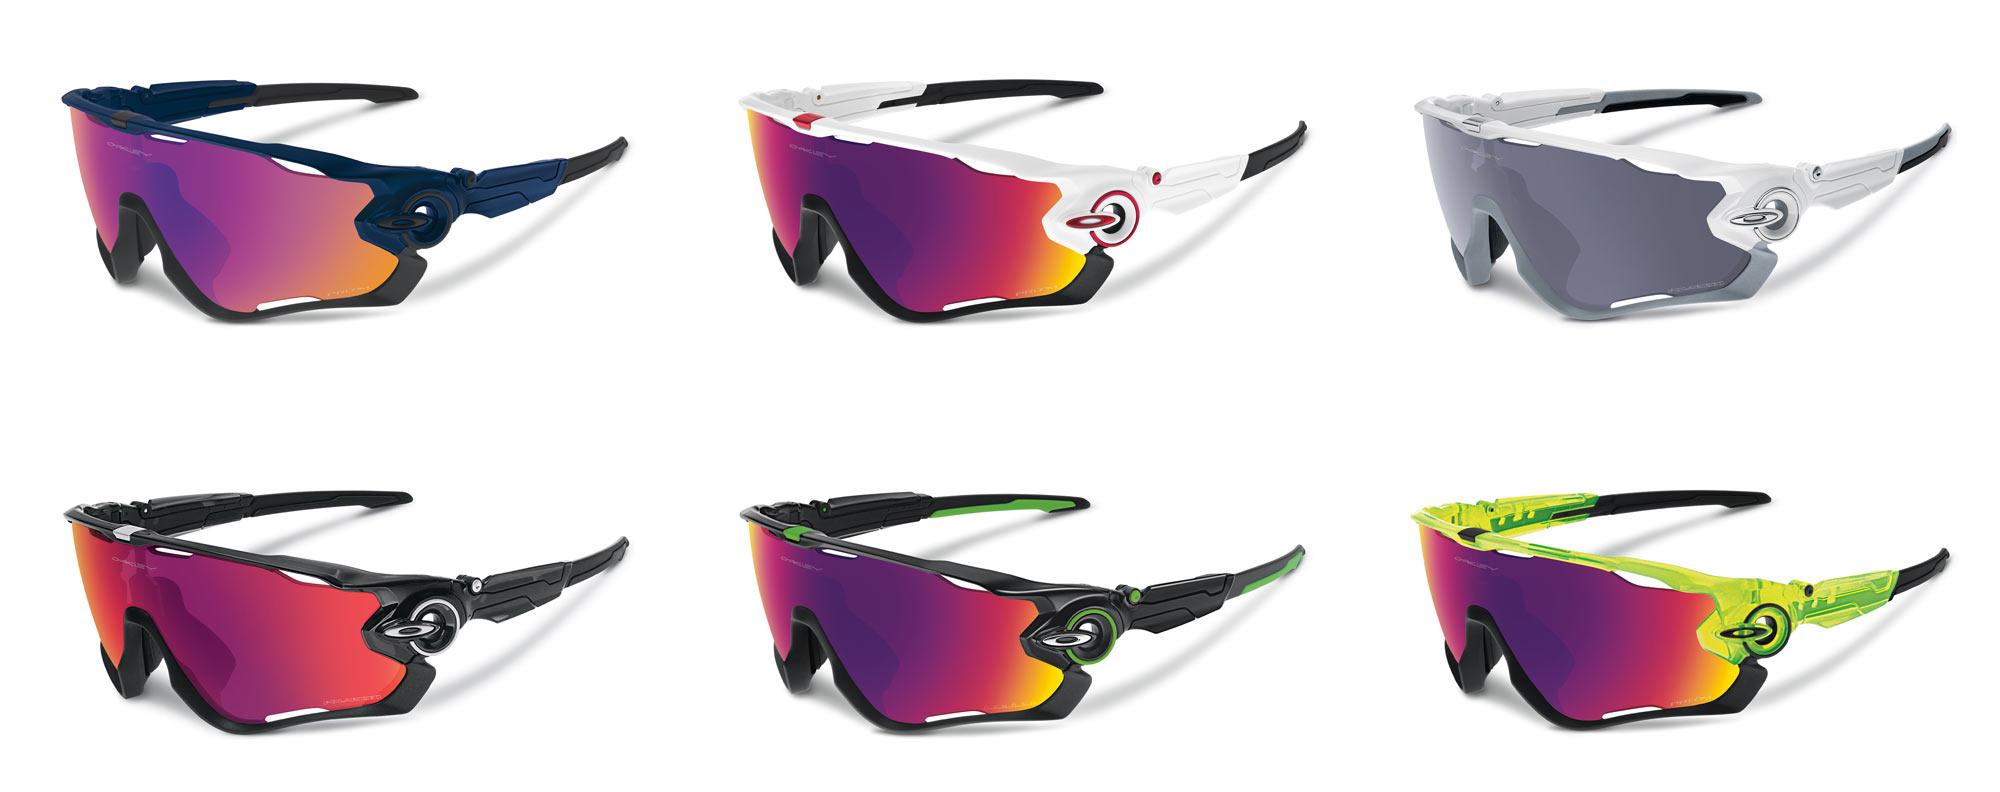 Cavendish-designed Oakley Jawbreaker sunglasses finally official ... f7ffa1468